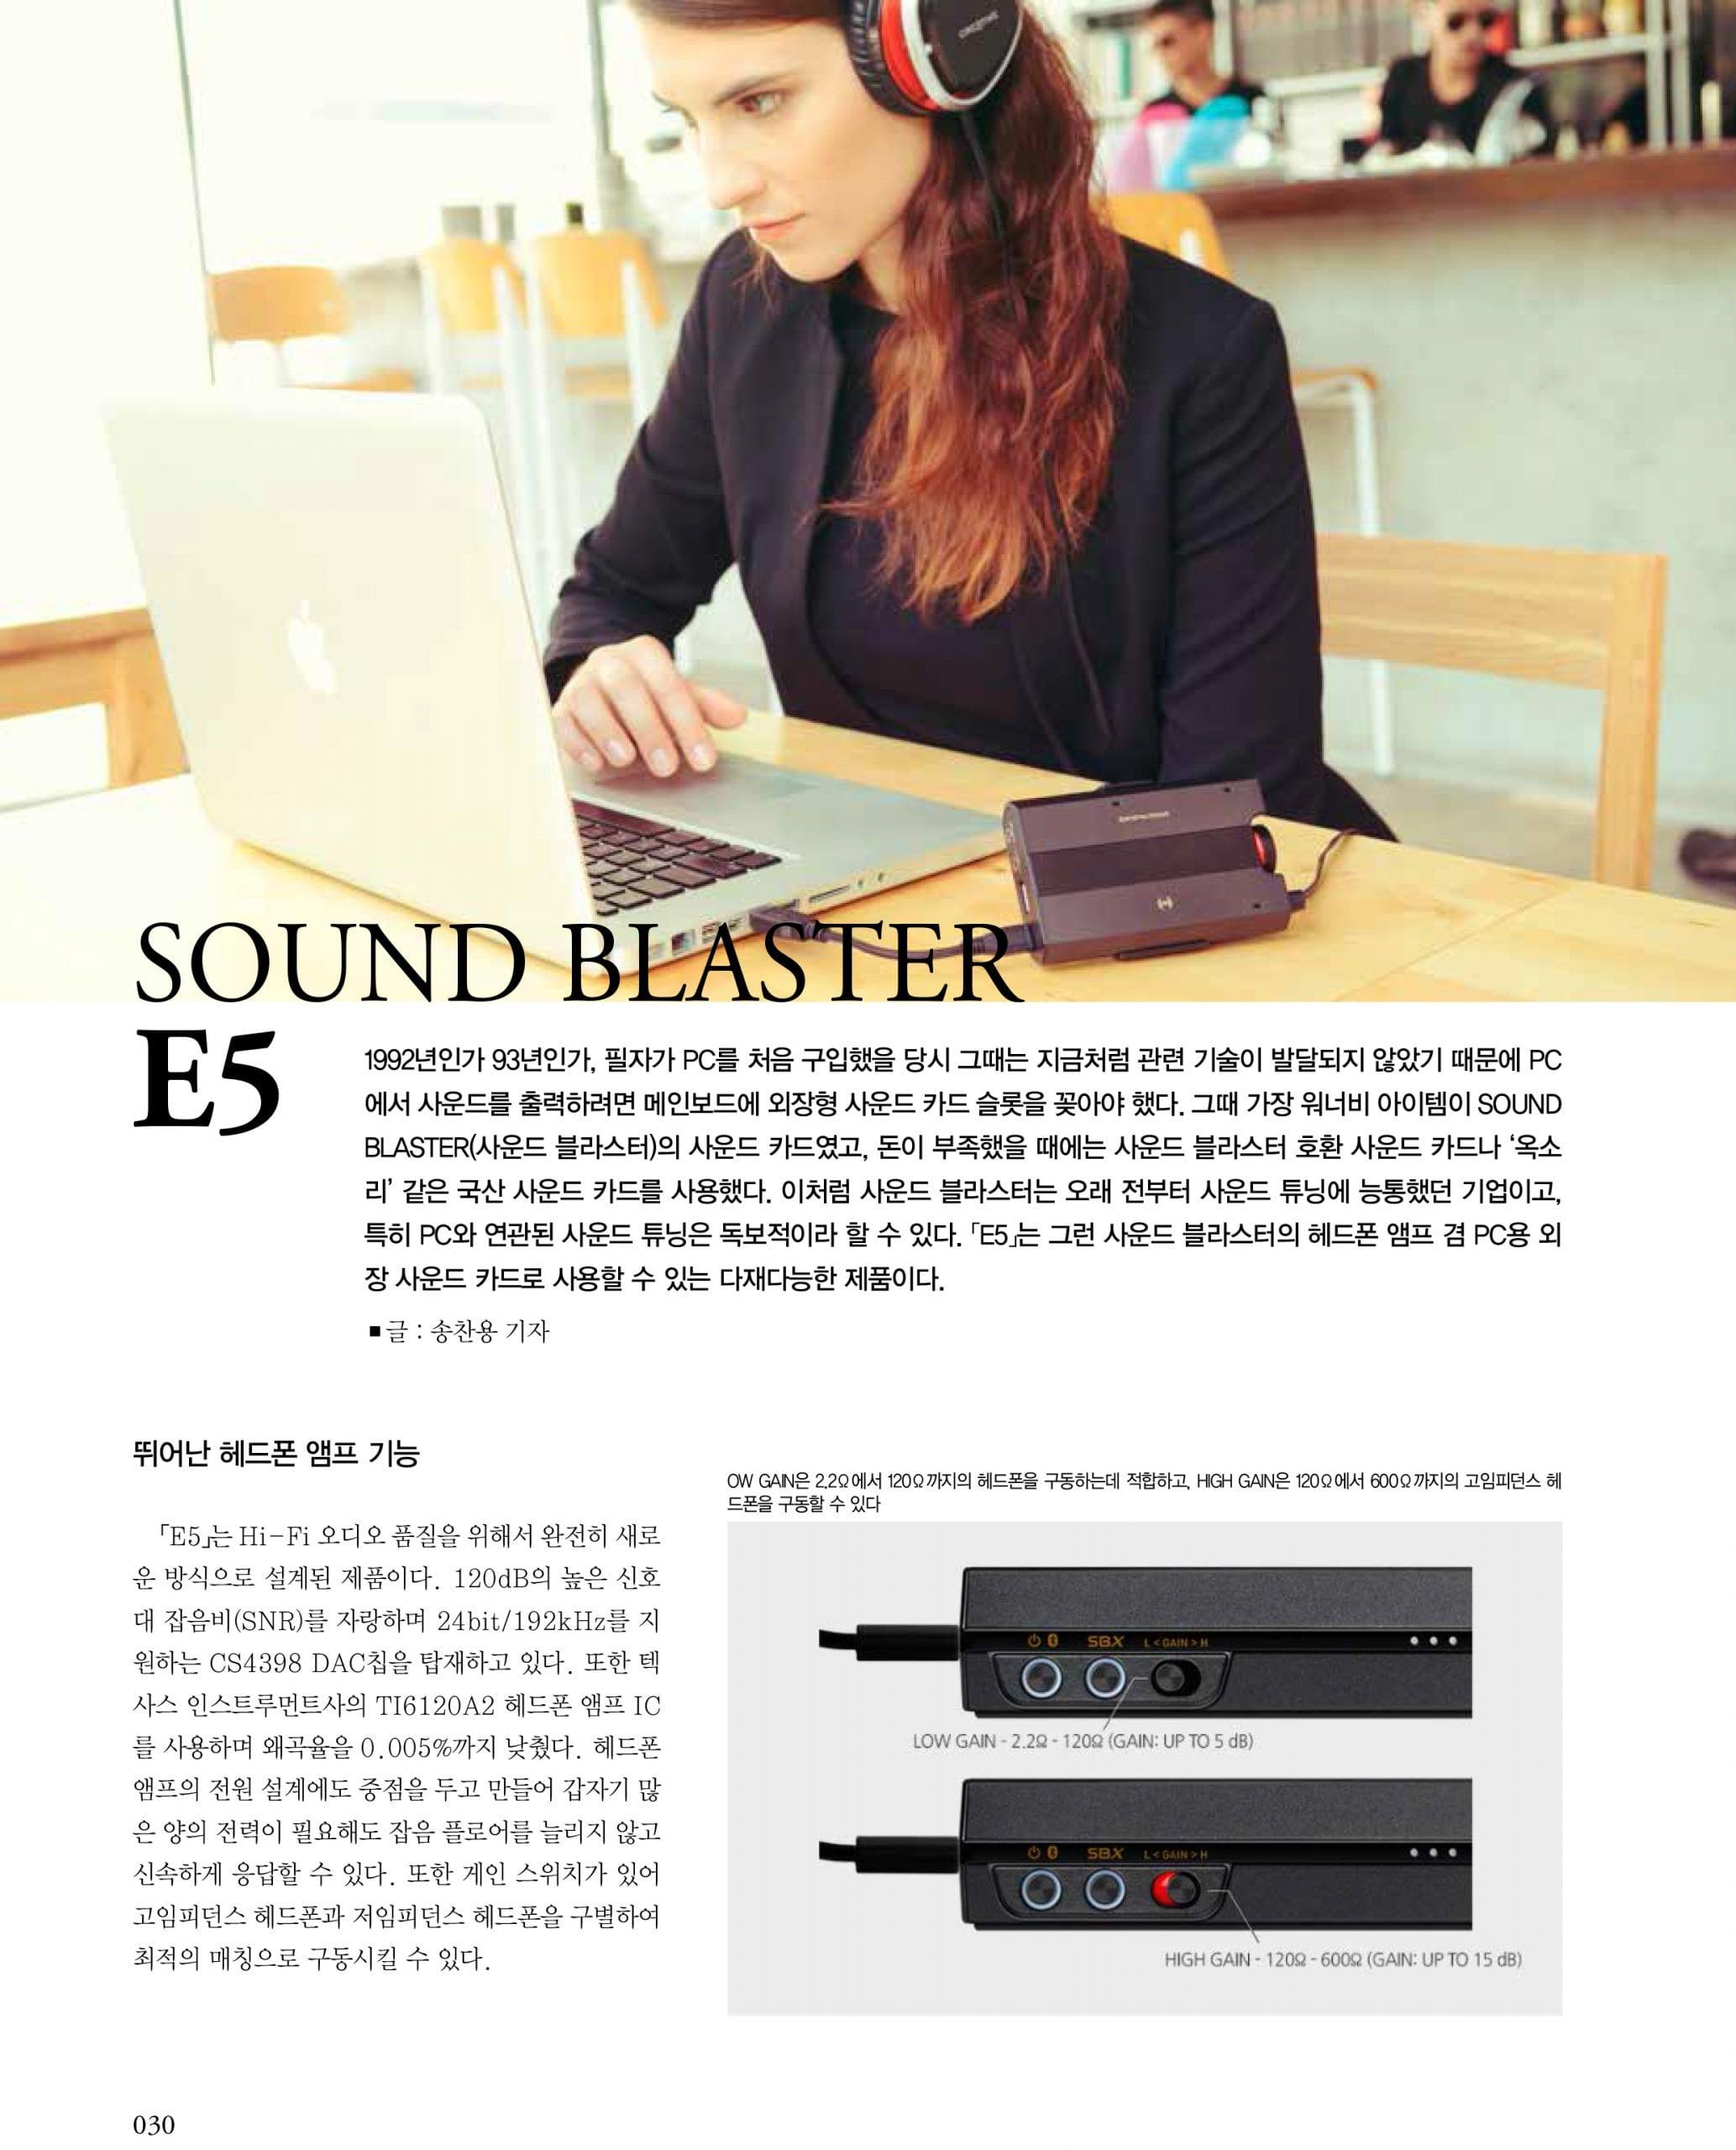 Sound Blaster_E5-1